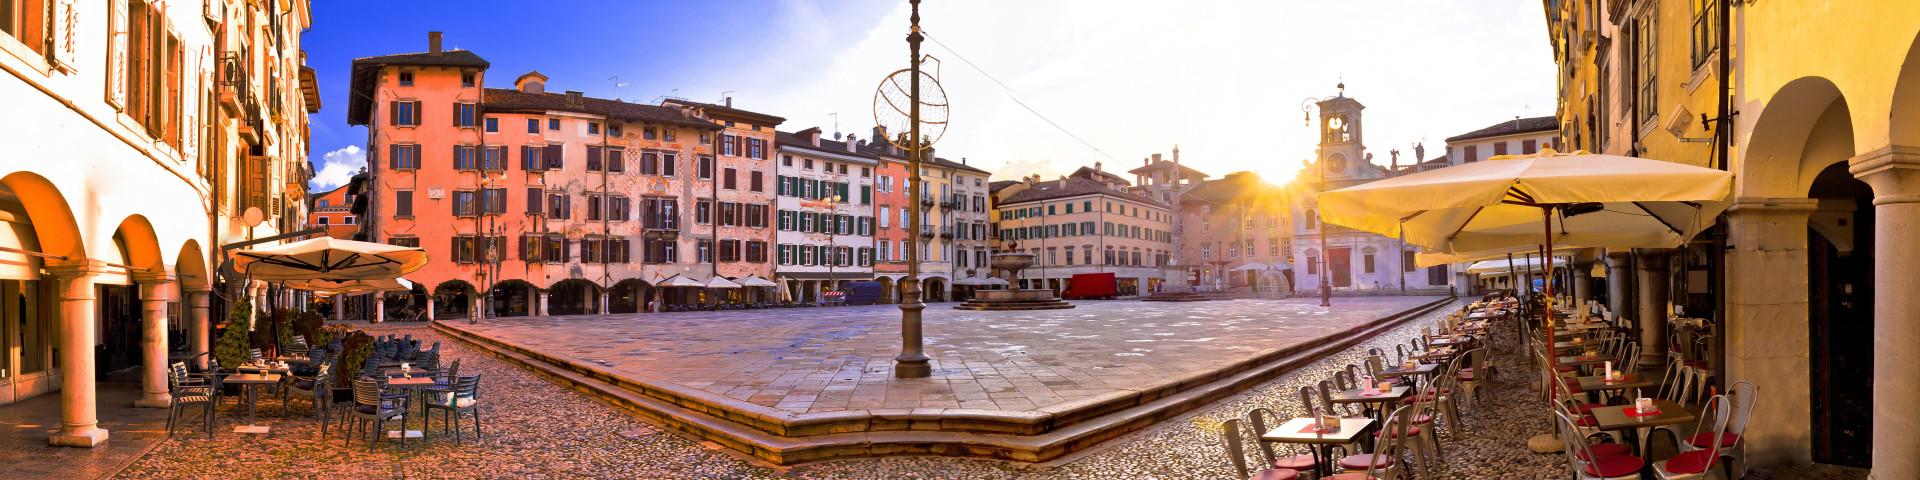 Udine - náměstí Piazza San Giacomo